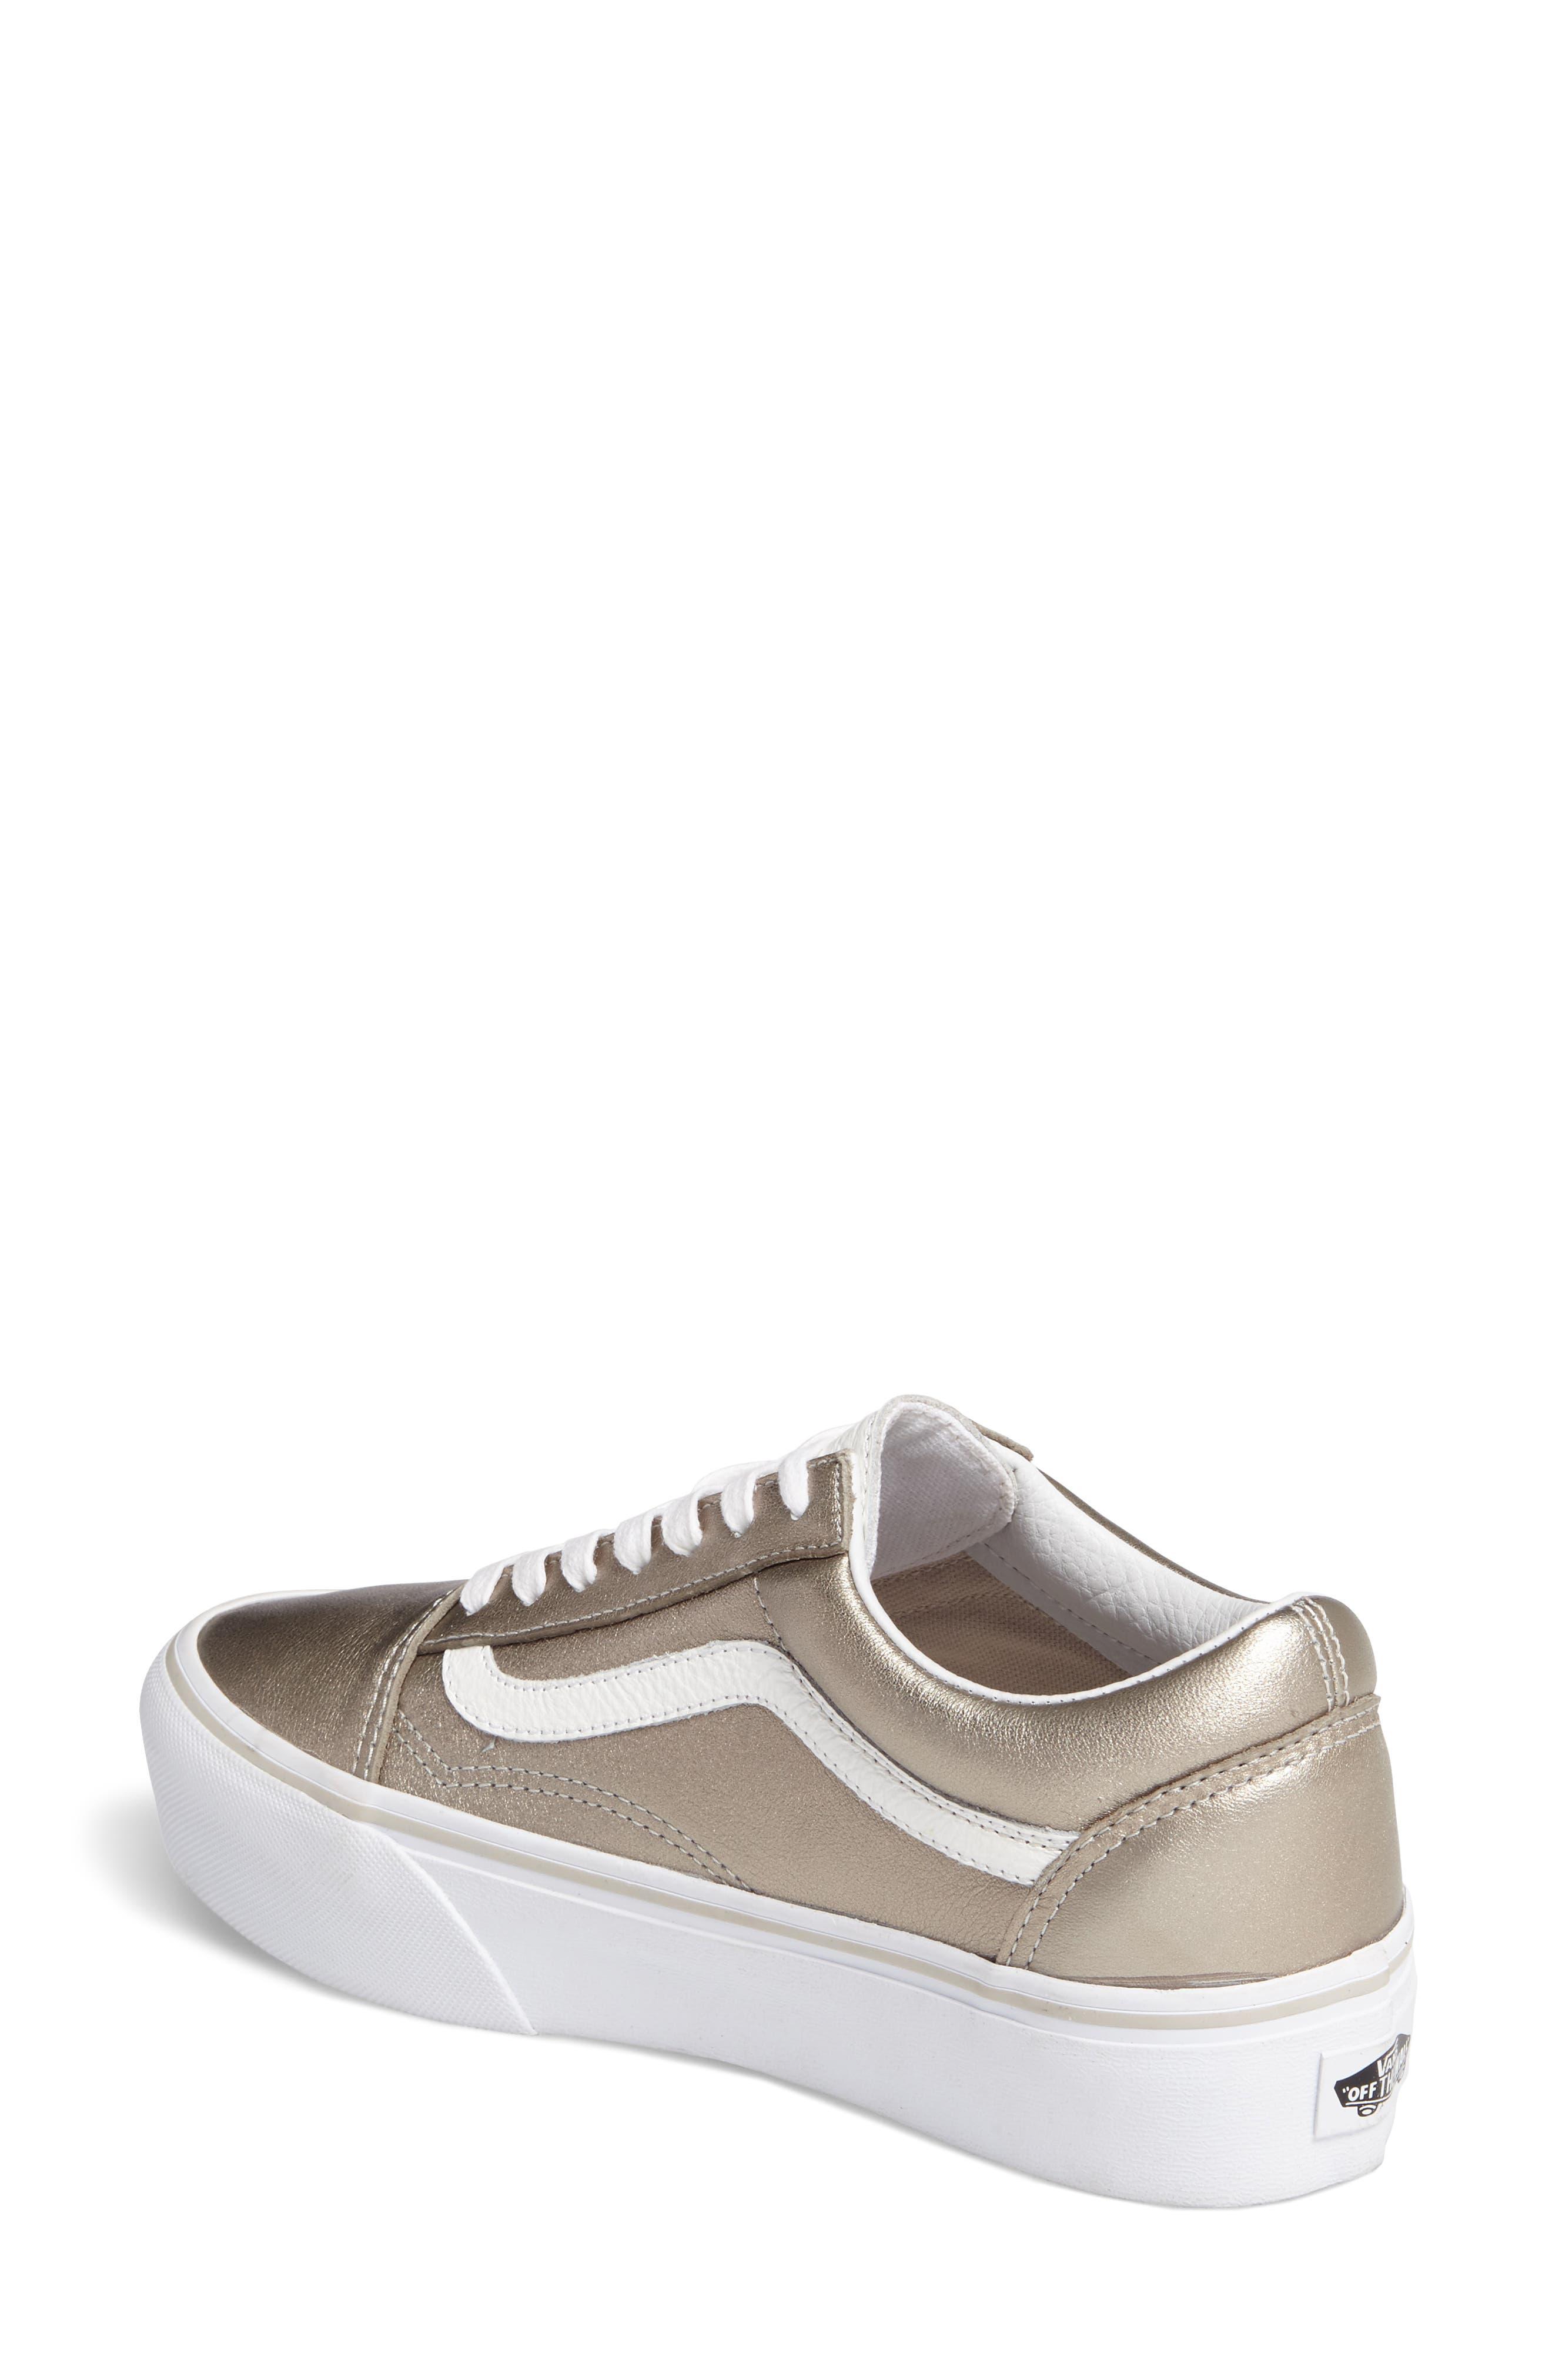 Old Skool Platform Sneaker,                             Alternate thumbnail 10, color,